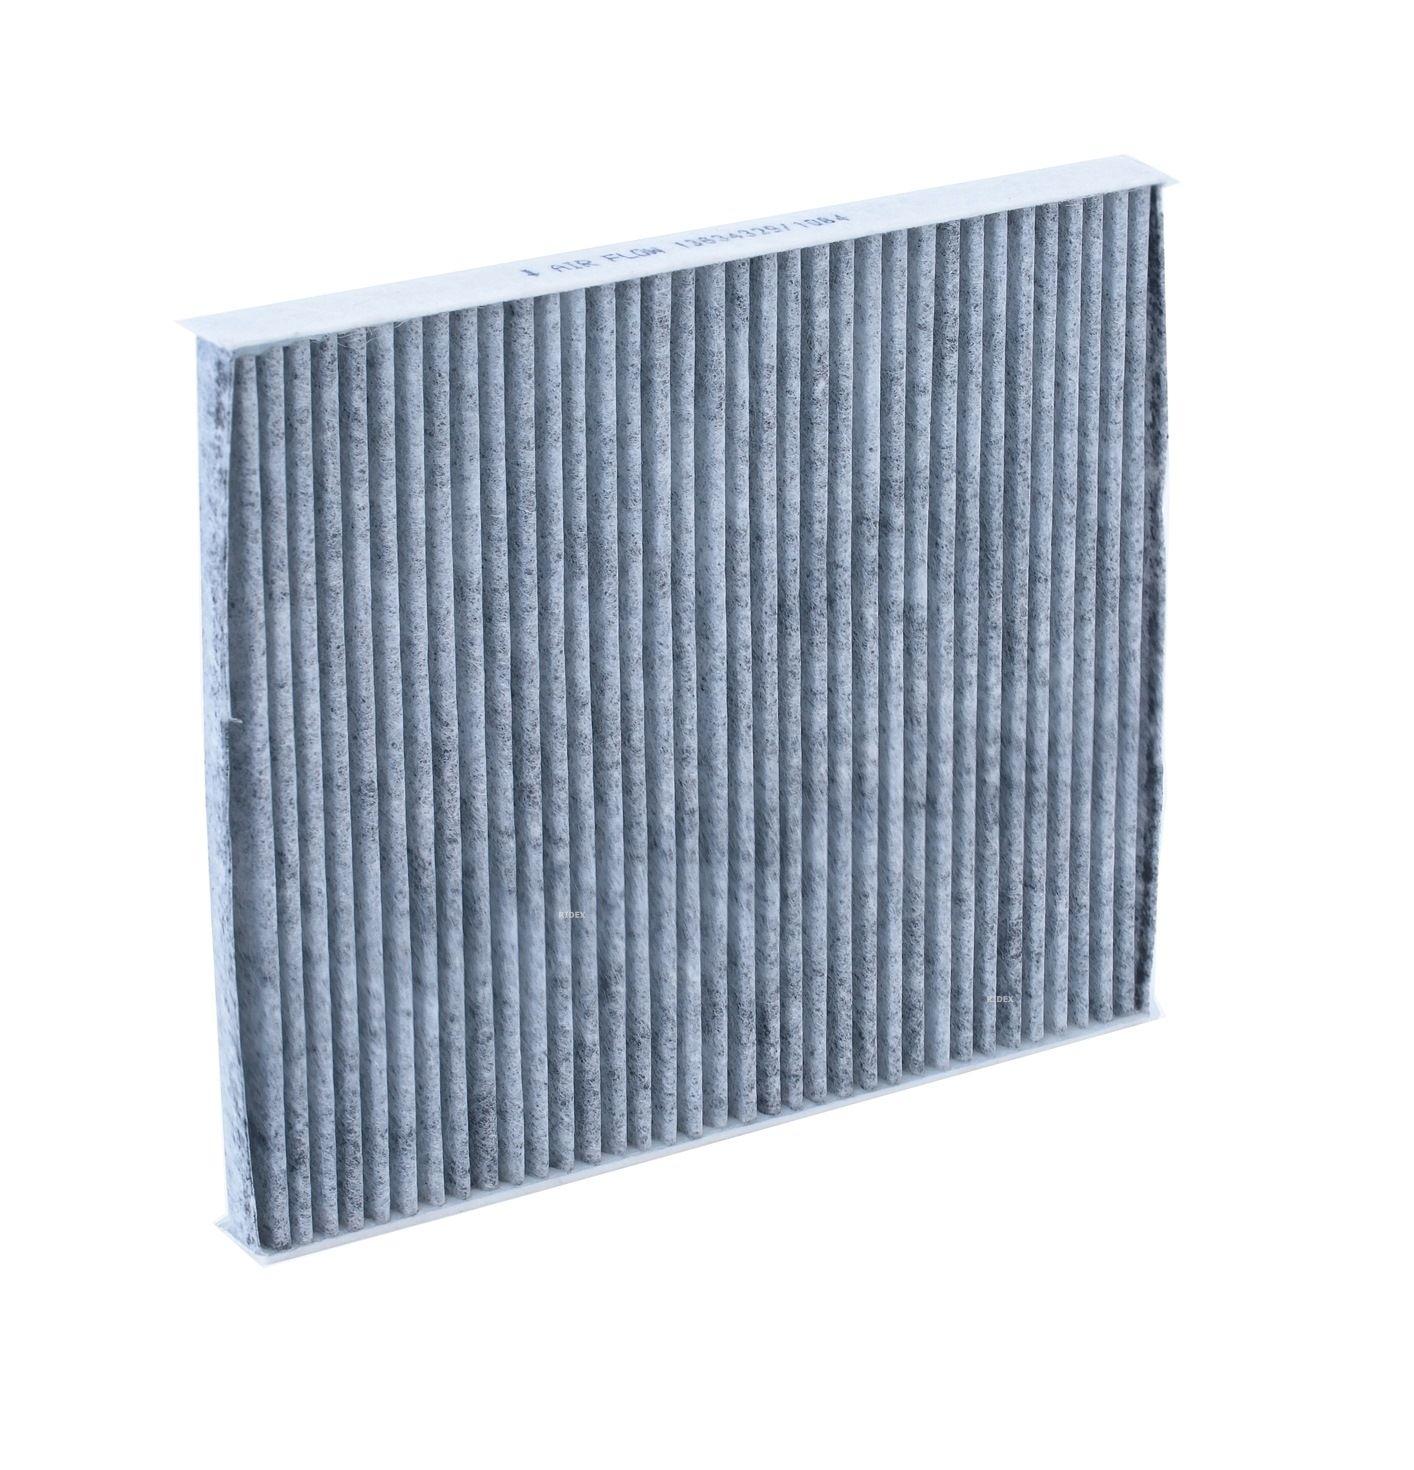 Buy original Heater RIDEX 424I0400